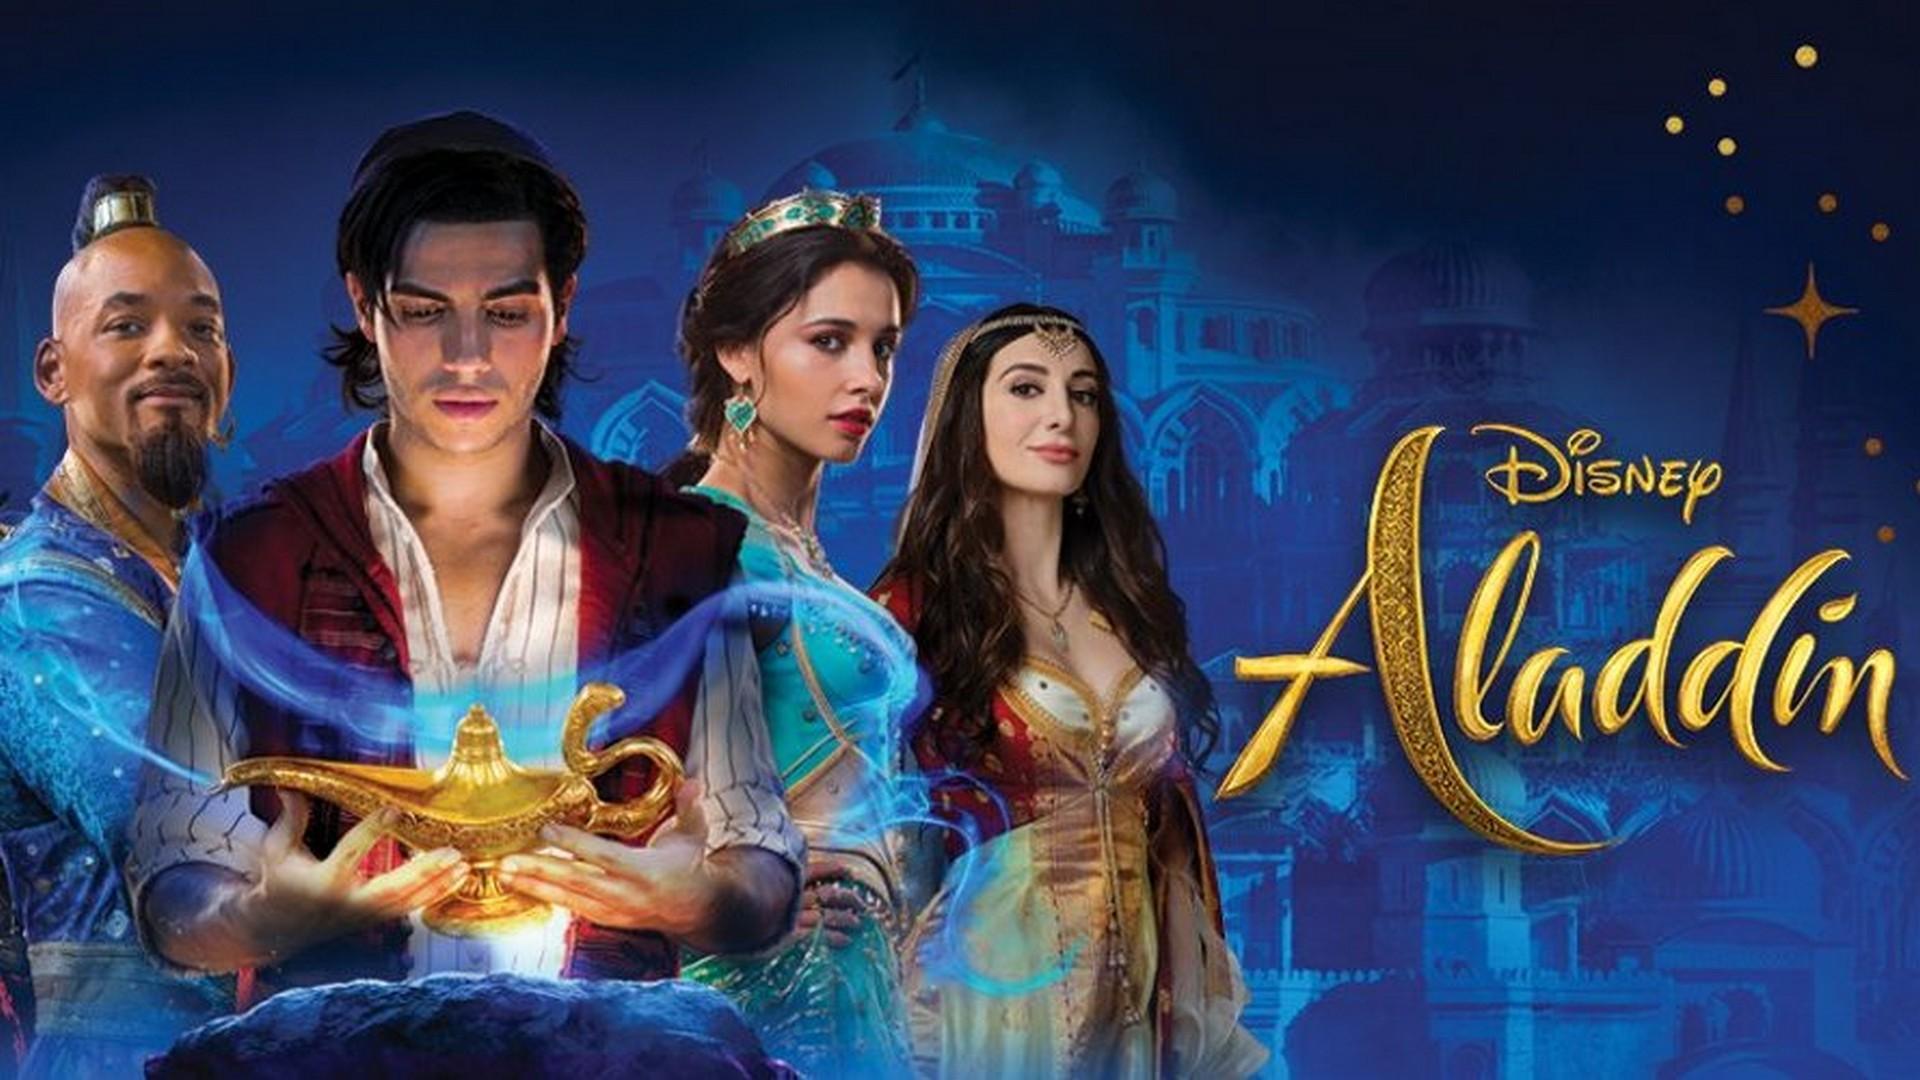 Disney Aladdin Poster 2019